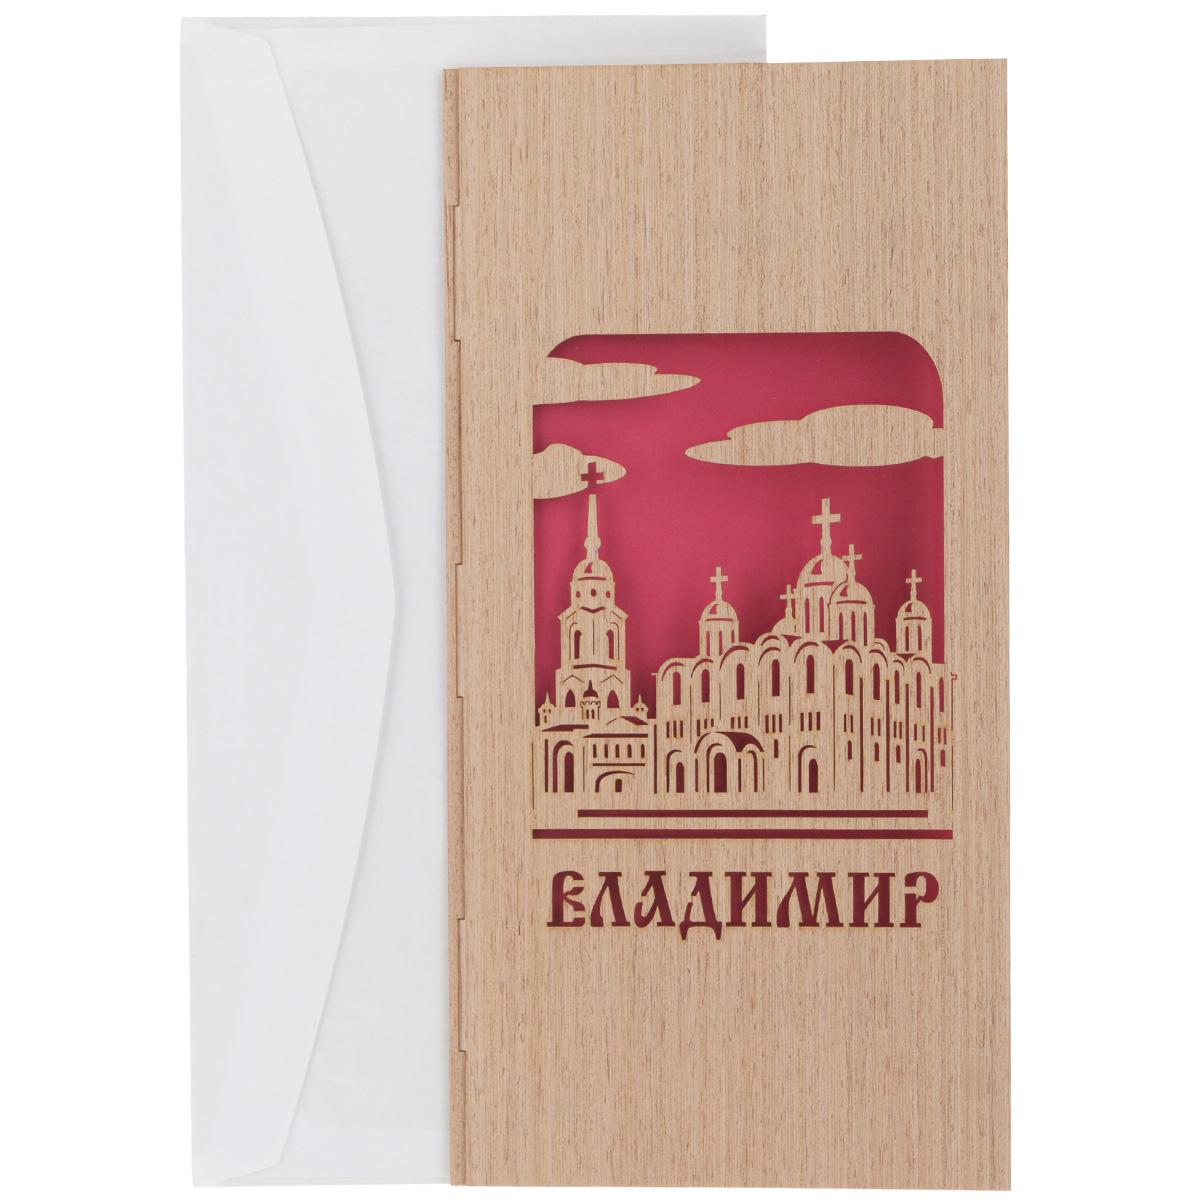 Открытка Караван-СТ Владимир, с конвертом. ОБ26ОБ26